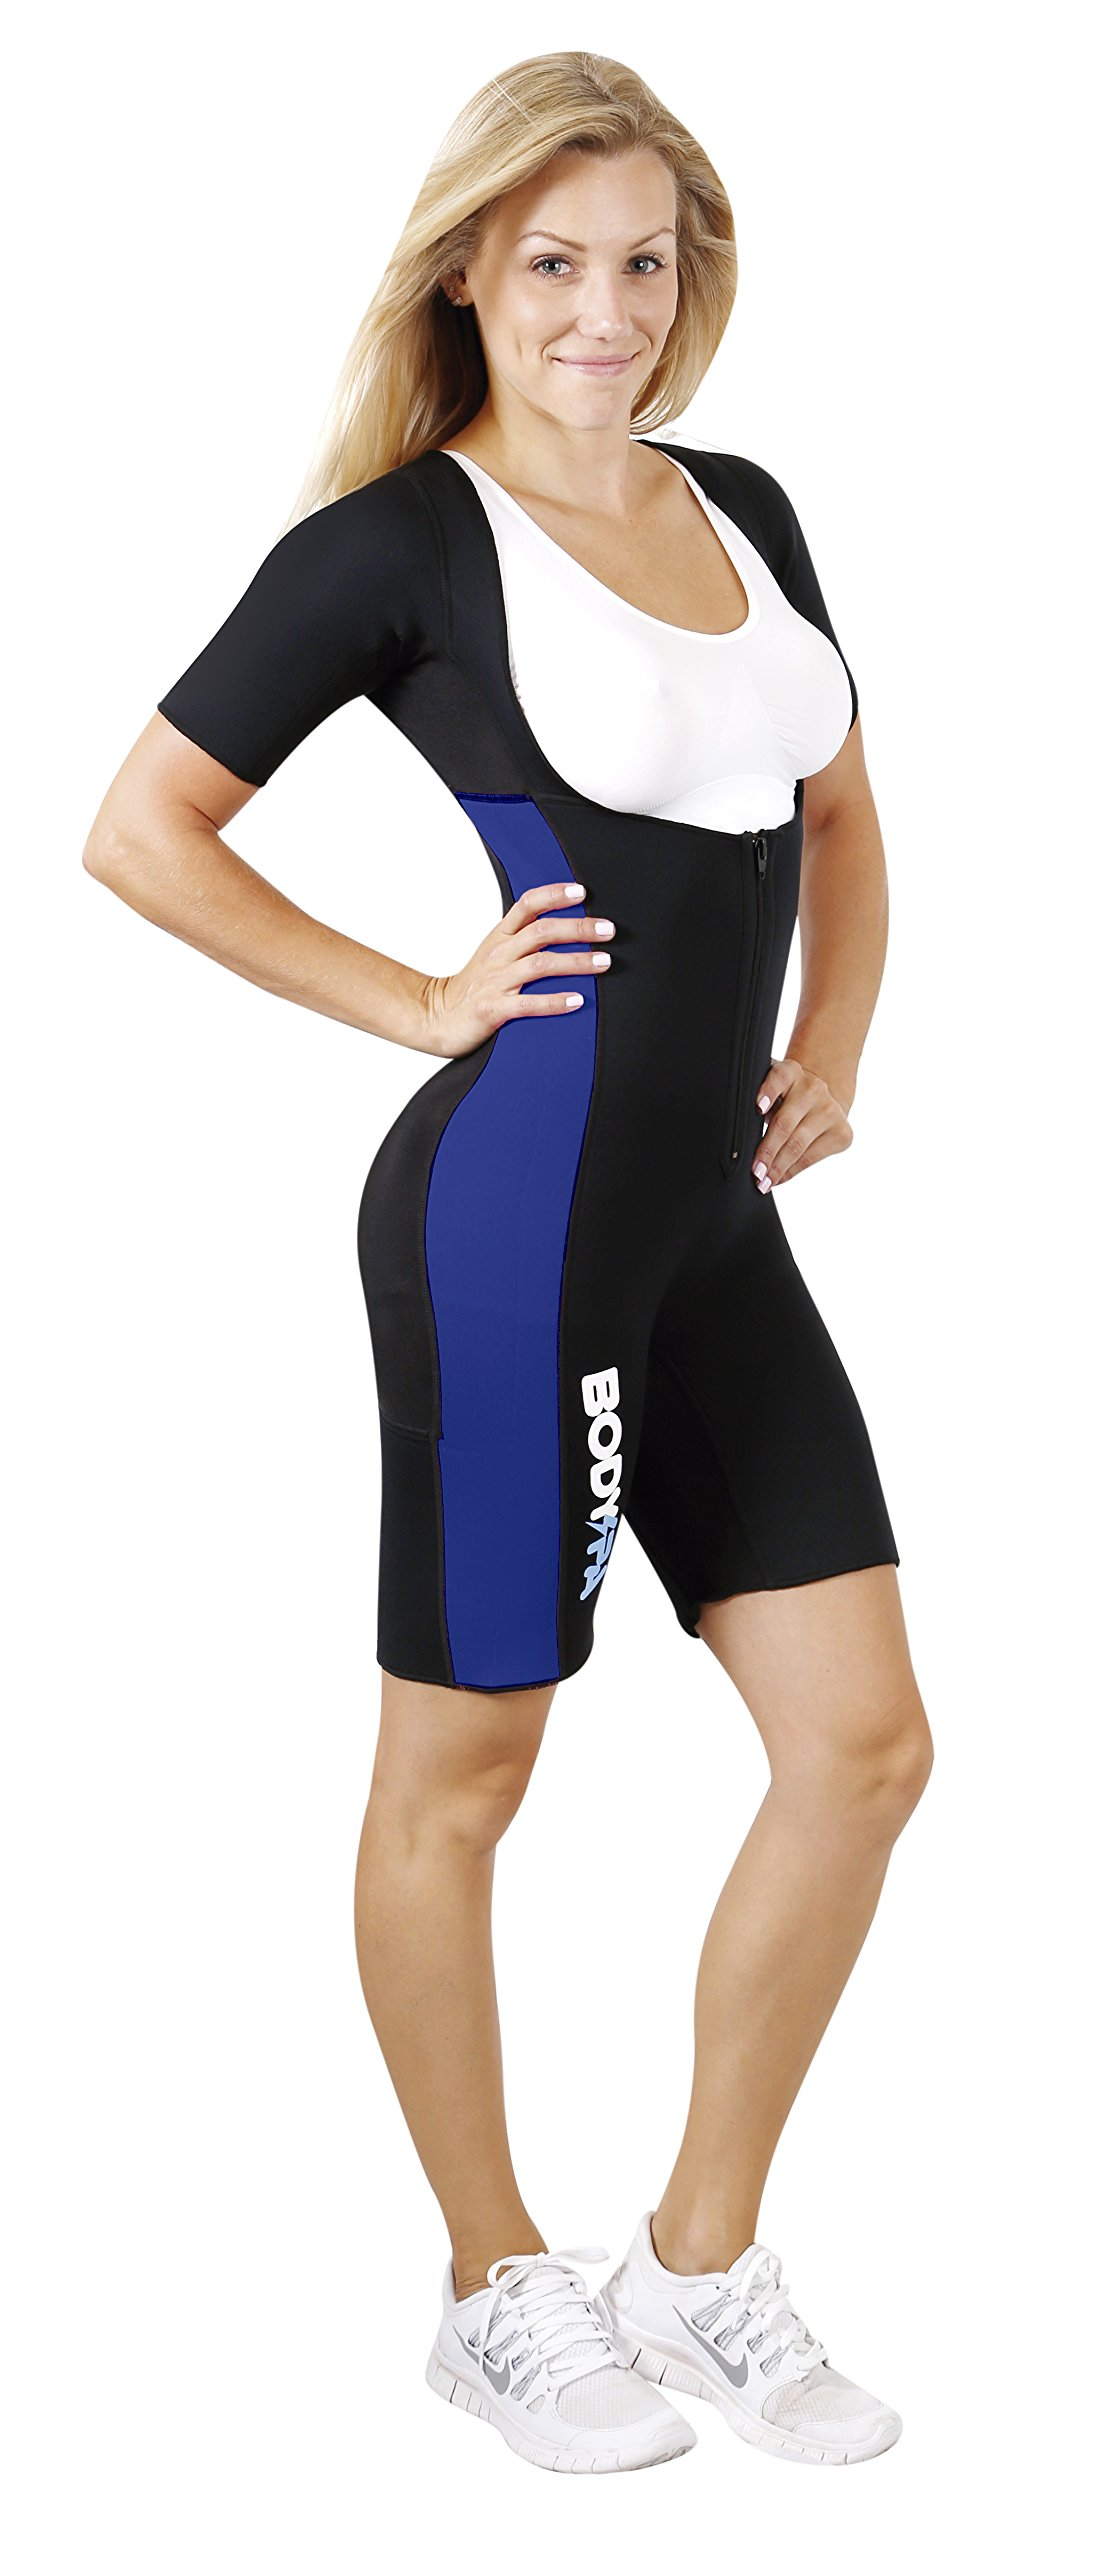 Body Spa Light Body Sauna Suit Neoprene Full Body Shaper Gym Sport Aerobic (Blue, XL) 13832